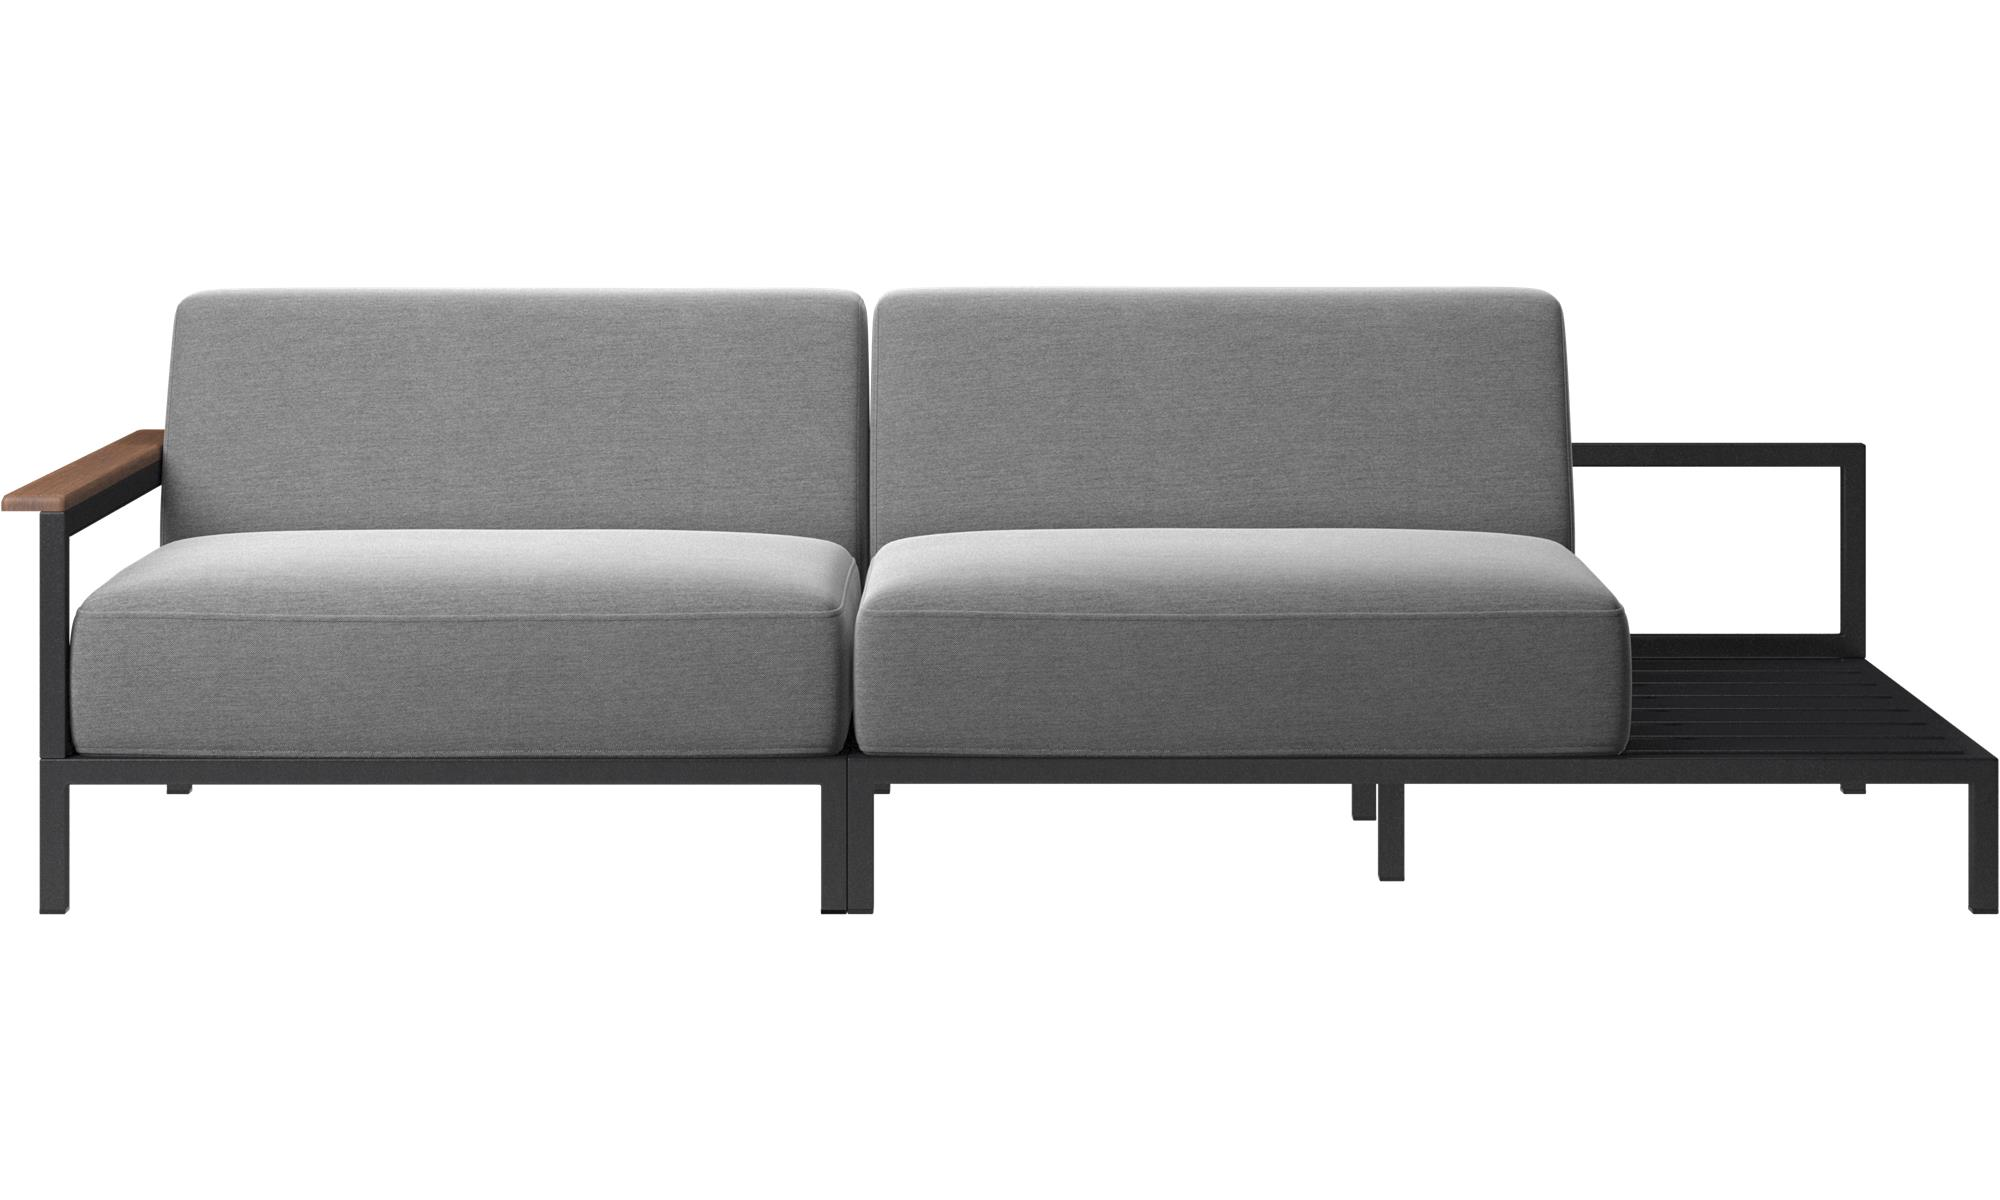 outdoor sofas - rome outdoor sofa - gray - fabric ... YTYRBZT